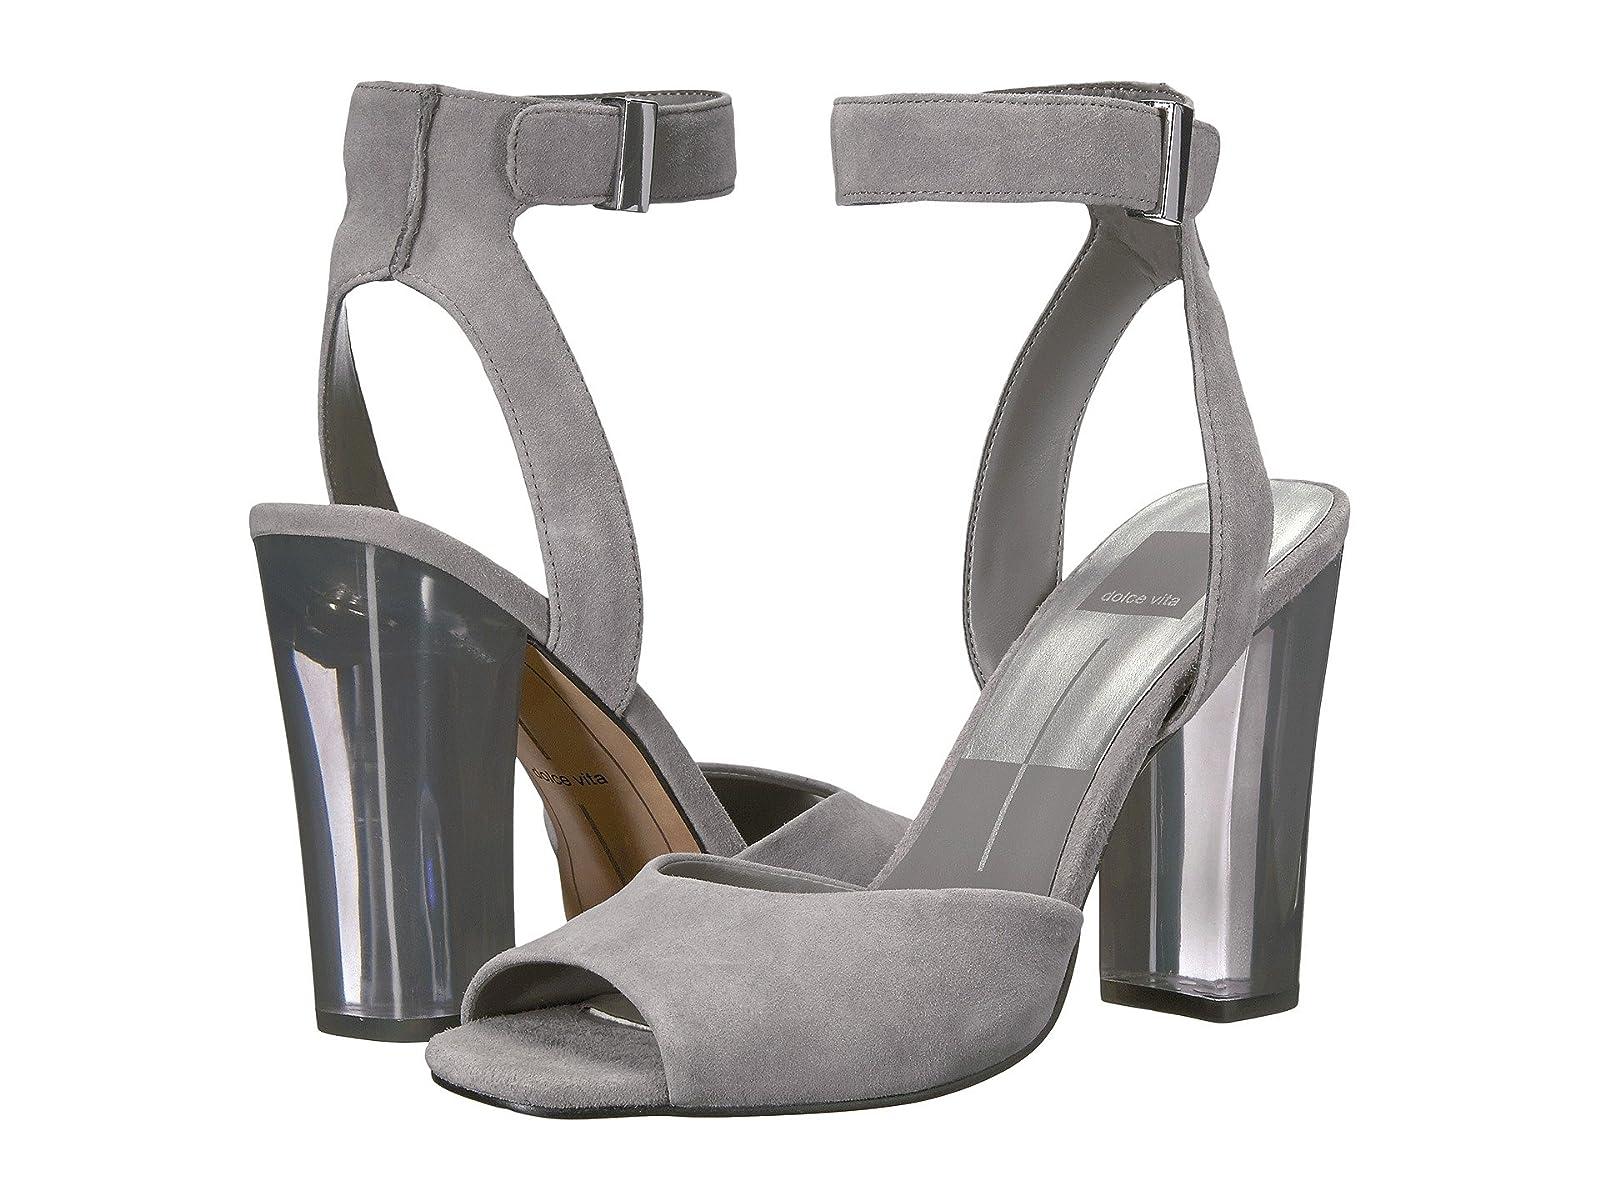 Dolce Vita HadesCheap and distinctive eye-catching shoes